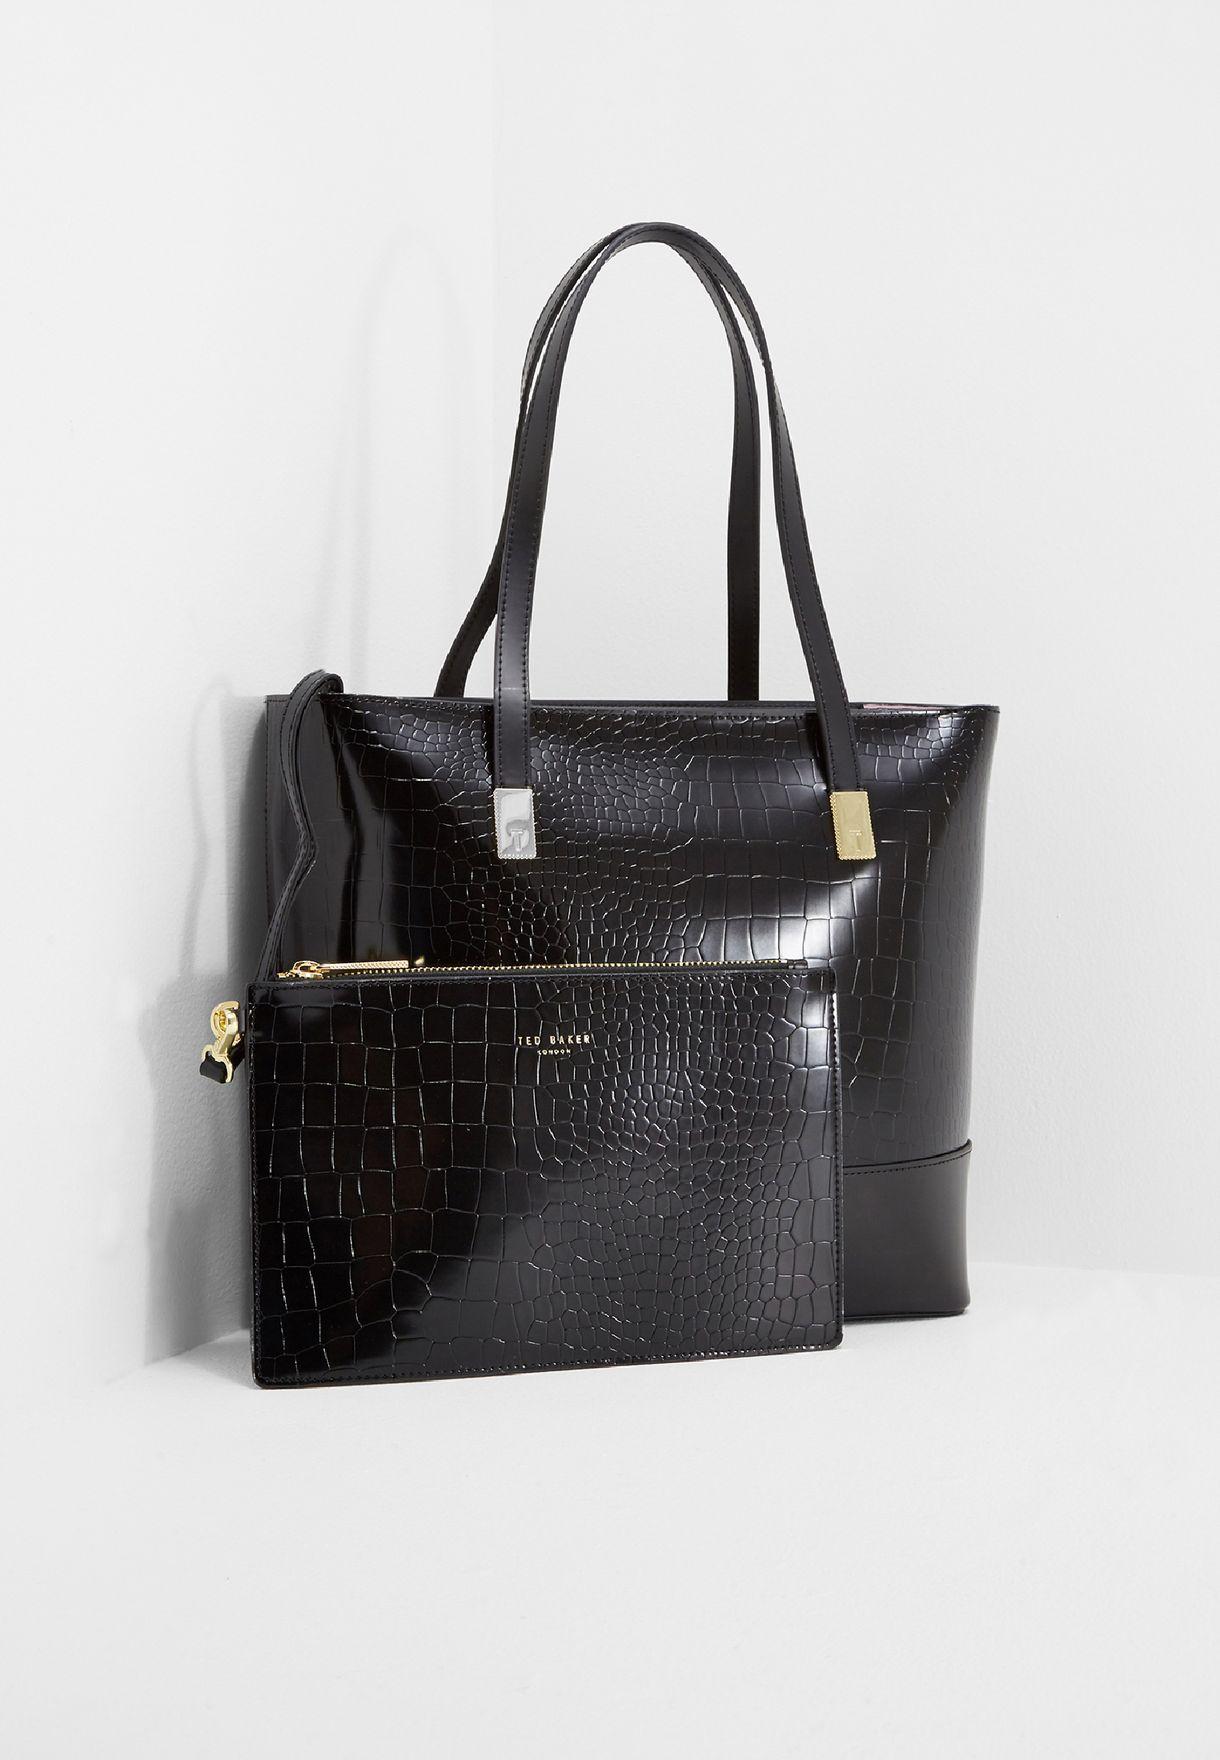 17a52f808c Shop Ted baker black Large Exotic Detail Shopper XBQ3/CARREN for ...